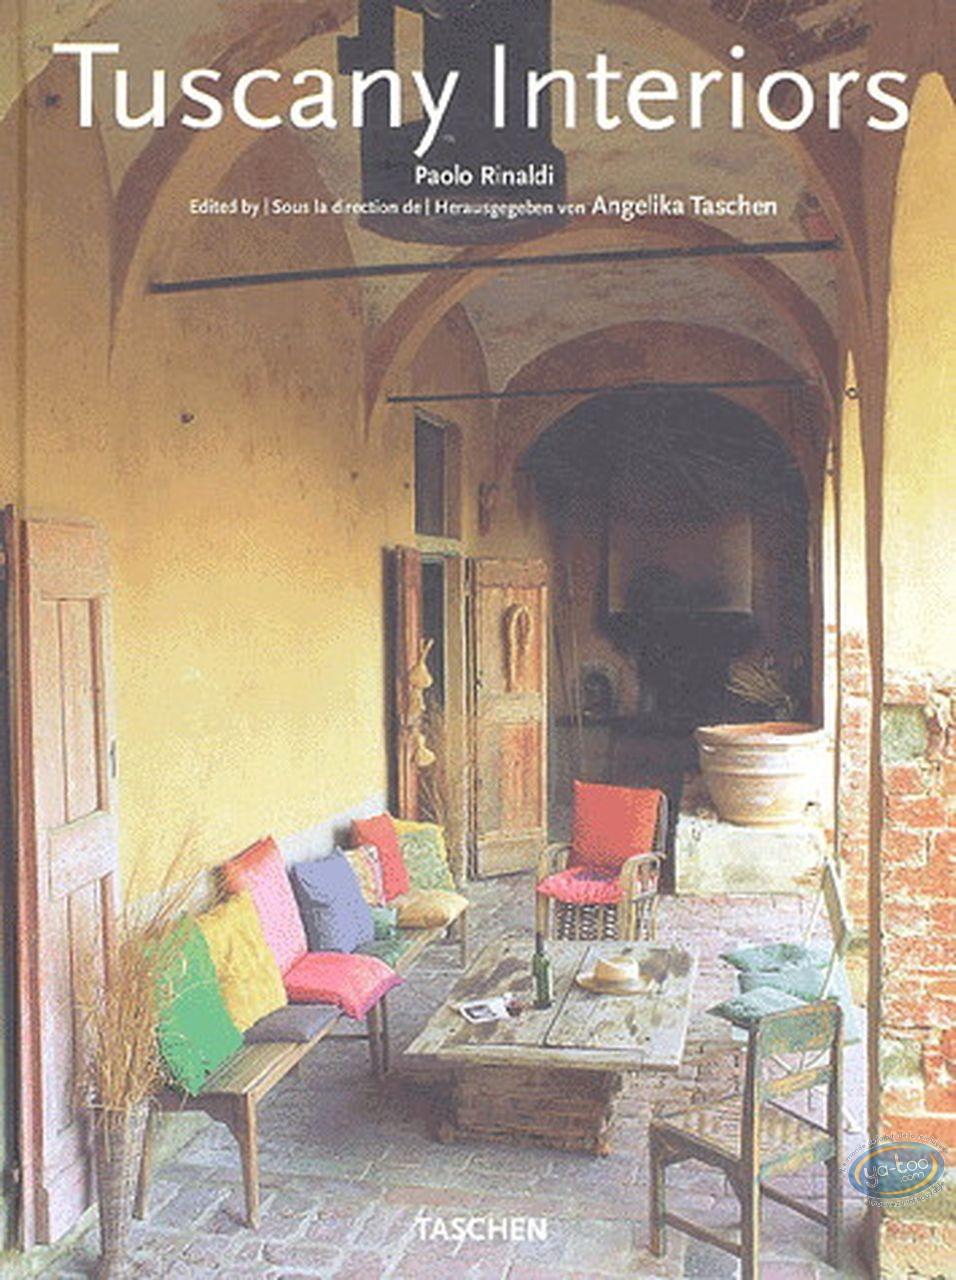 Book, Tuscany Interiors